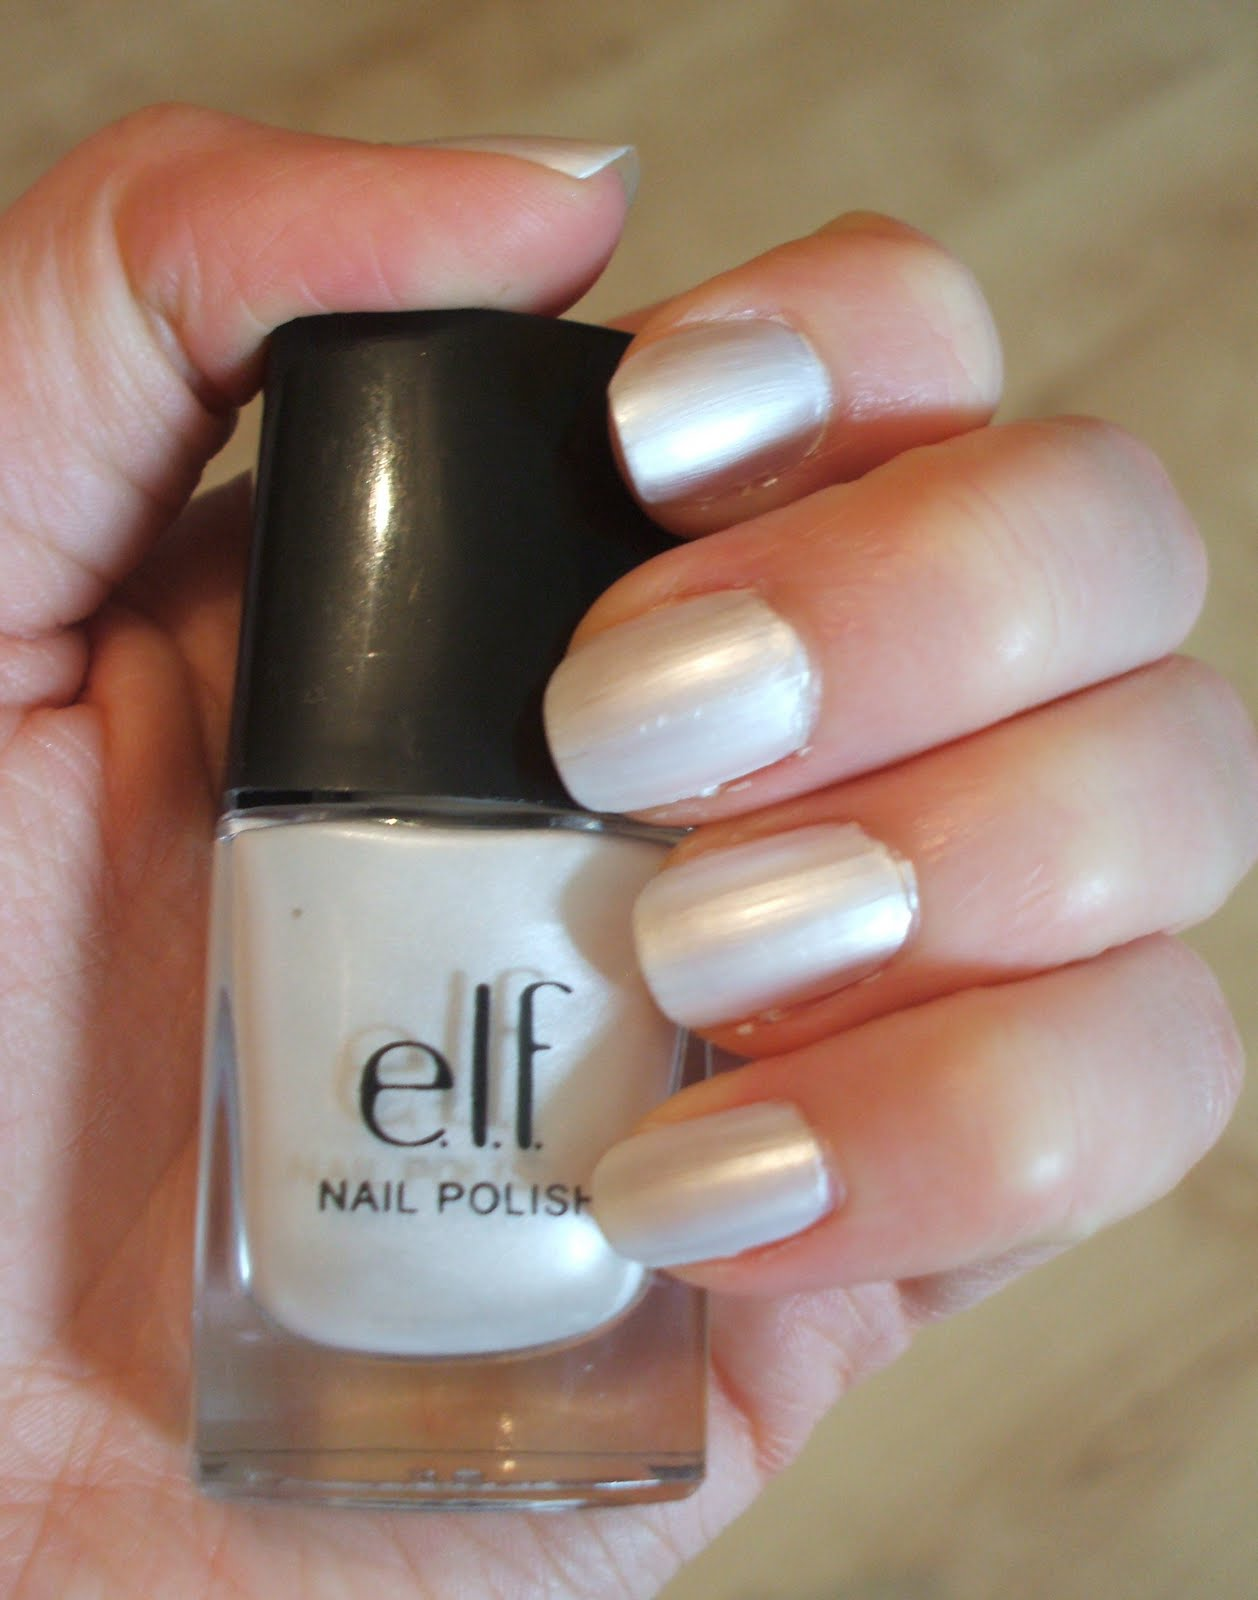 Definitelybeauty: Elf nail polish: Pearl